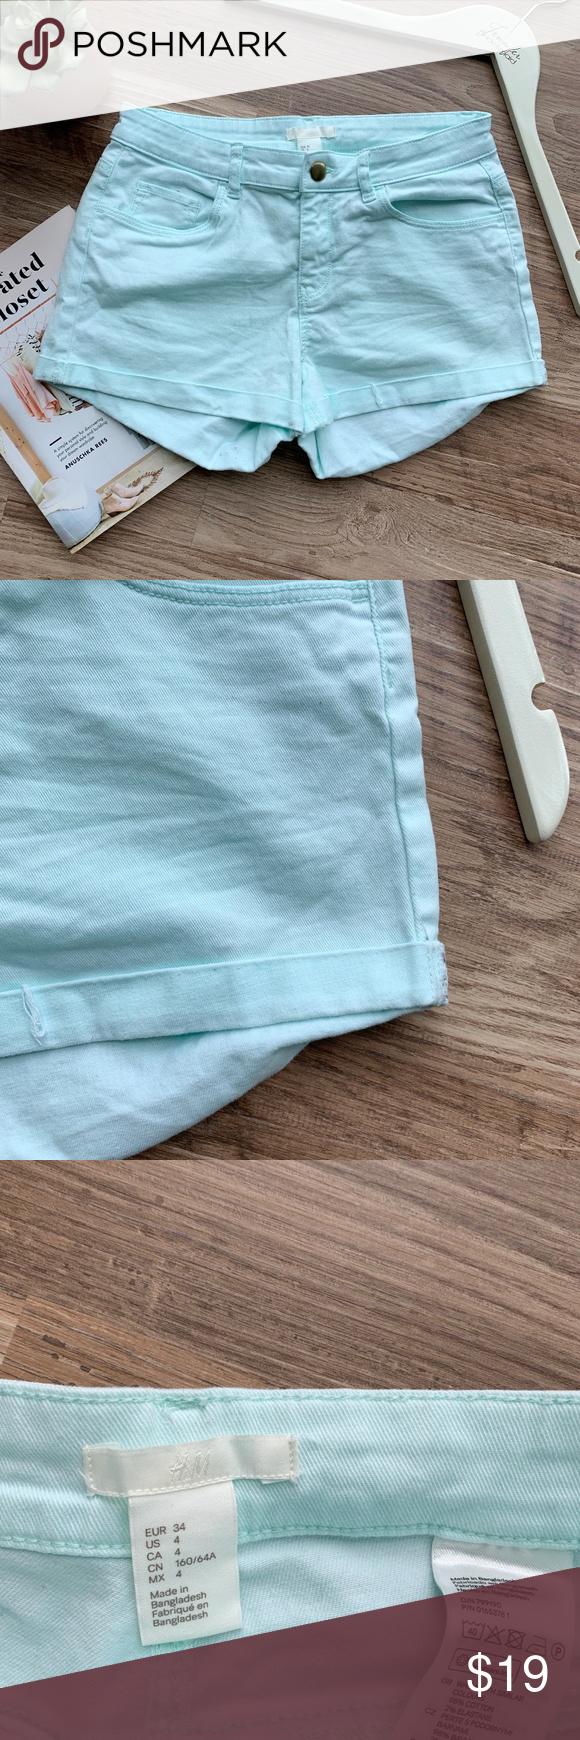 H&M Light Blue Denim Shorts H&M Light Blue Denim Shorts.  Short shorts.  Excellent condition.  Light blue green color.    No trades, offers welcome! H&M Shorts #lightblueshorts